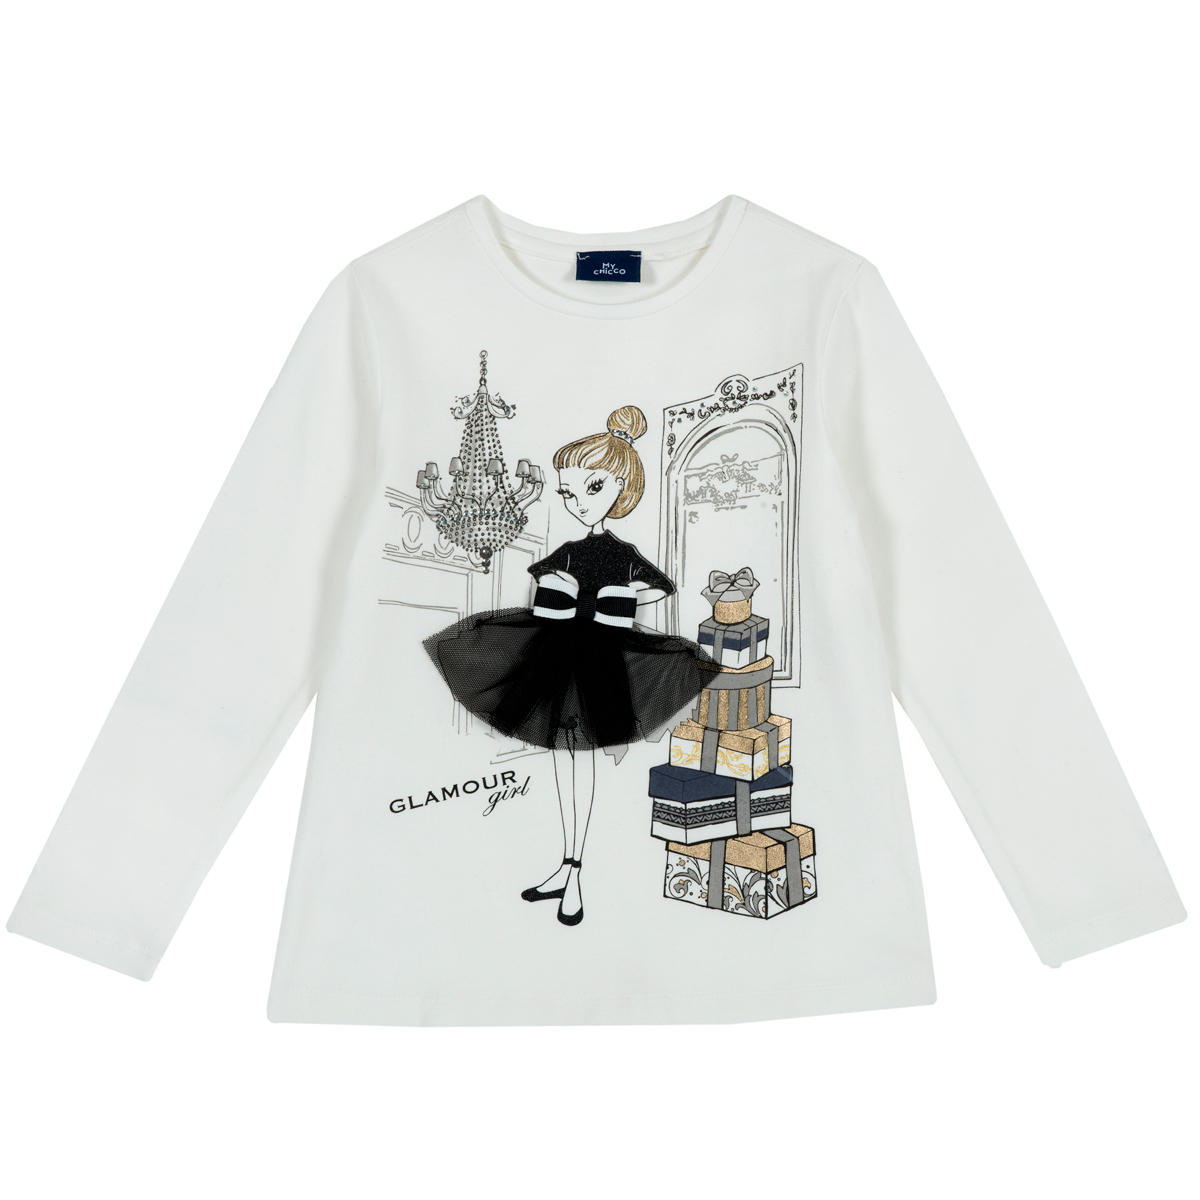 Tricou copii Chicco cu maneca lunga, alb. 06814 din categoria Tricouri copii